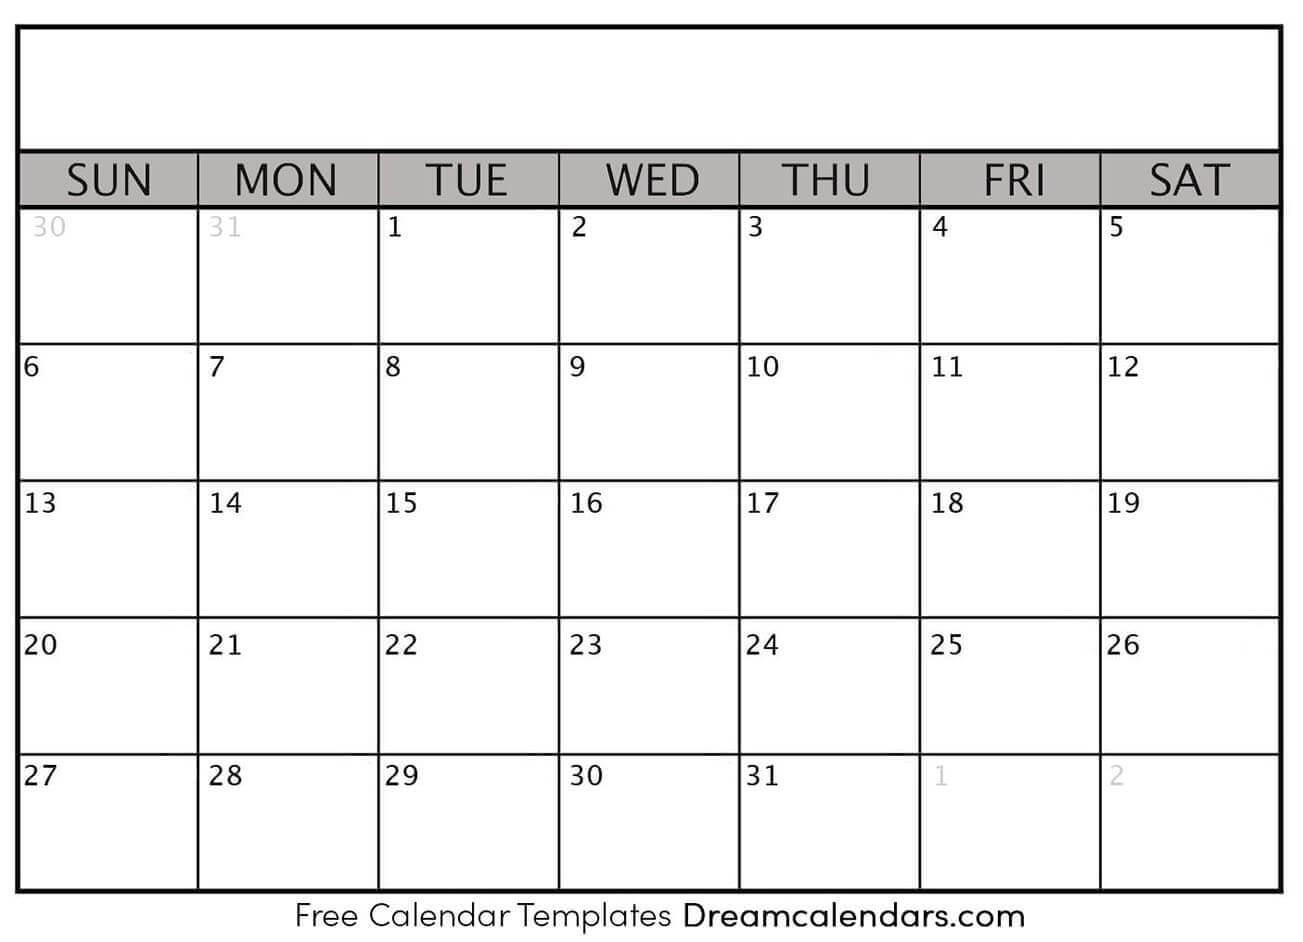 Printable Blank Calendar 2020 | Dream Calendars With Regard To Blank One Month Calendar Template